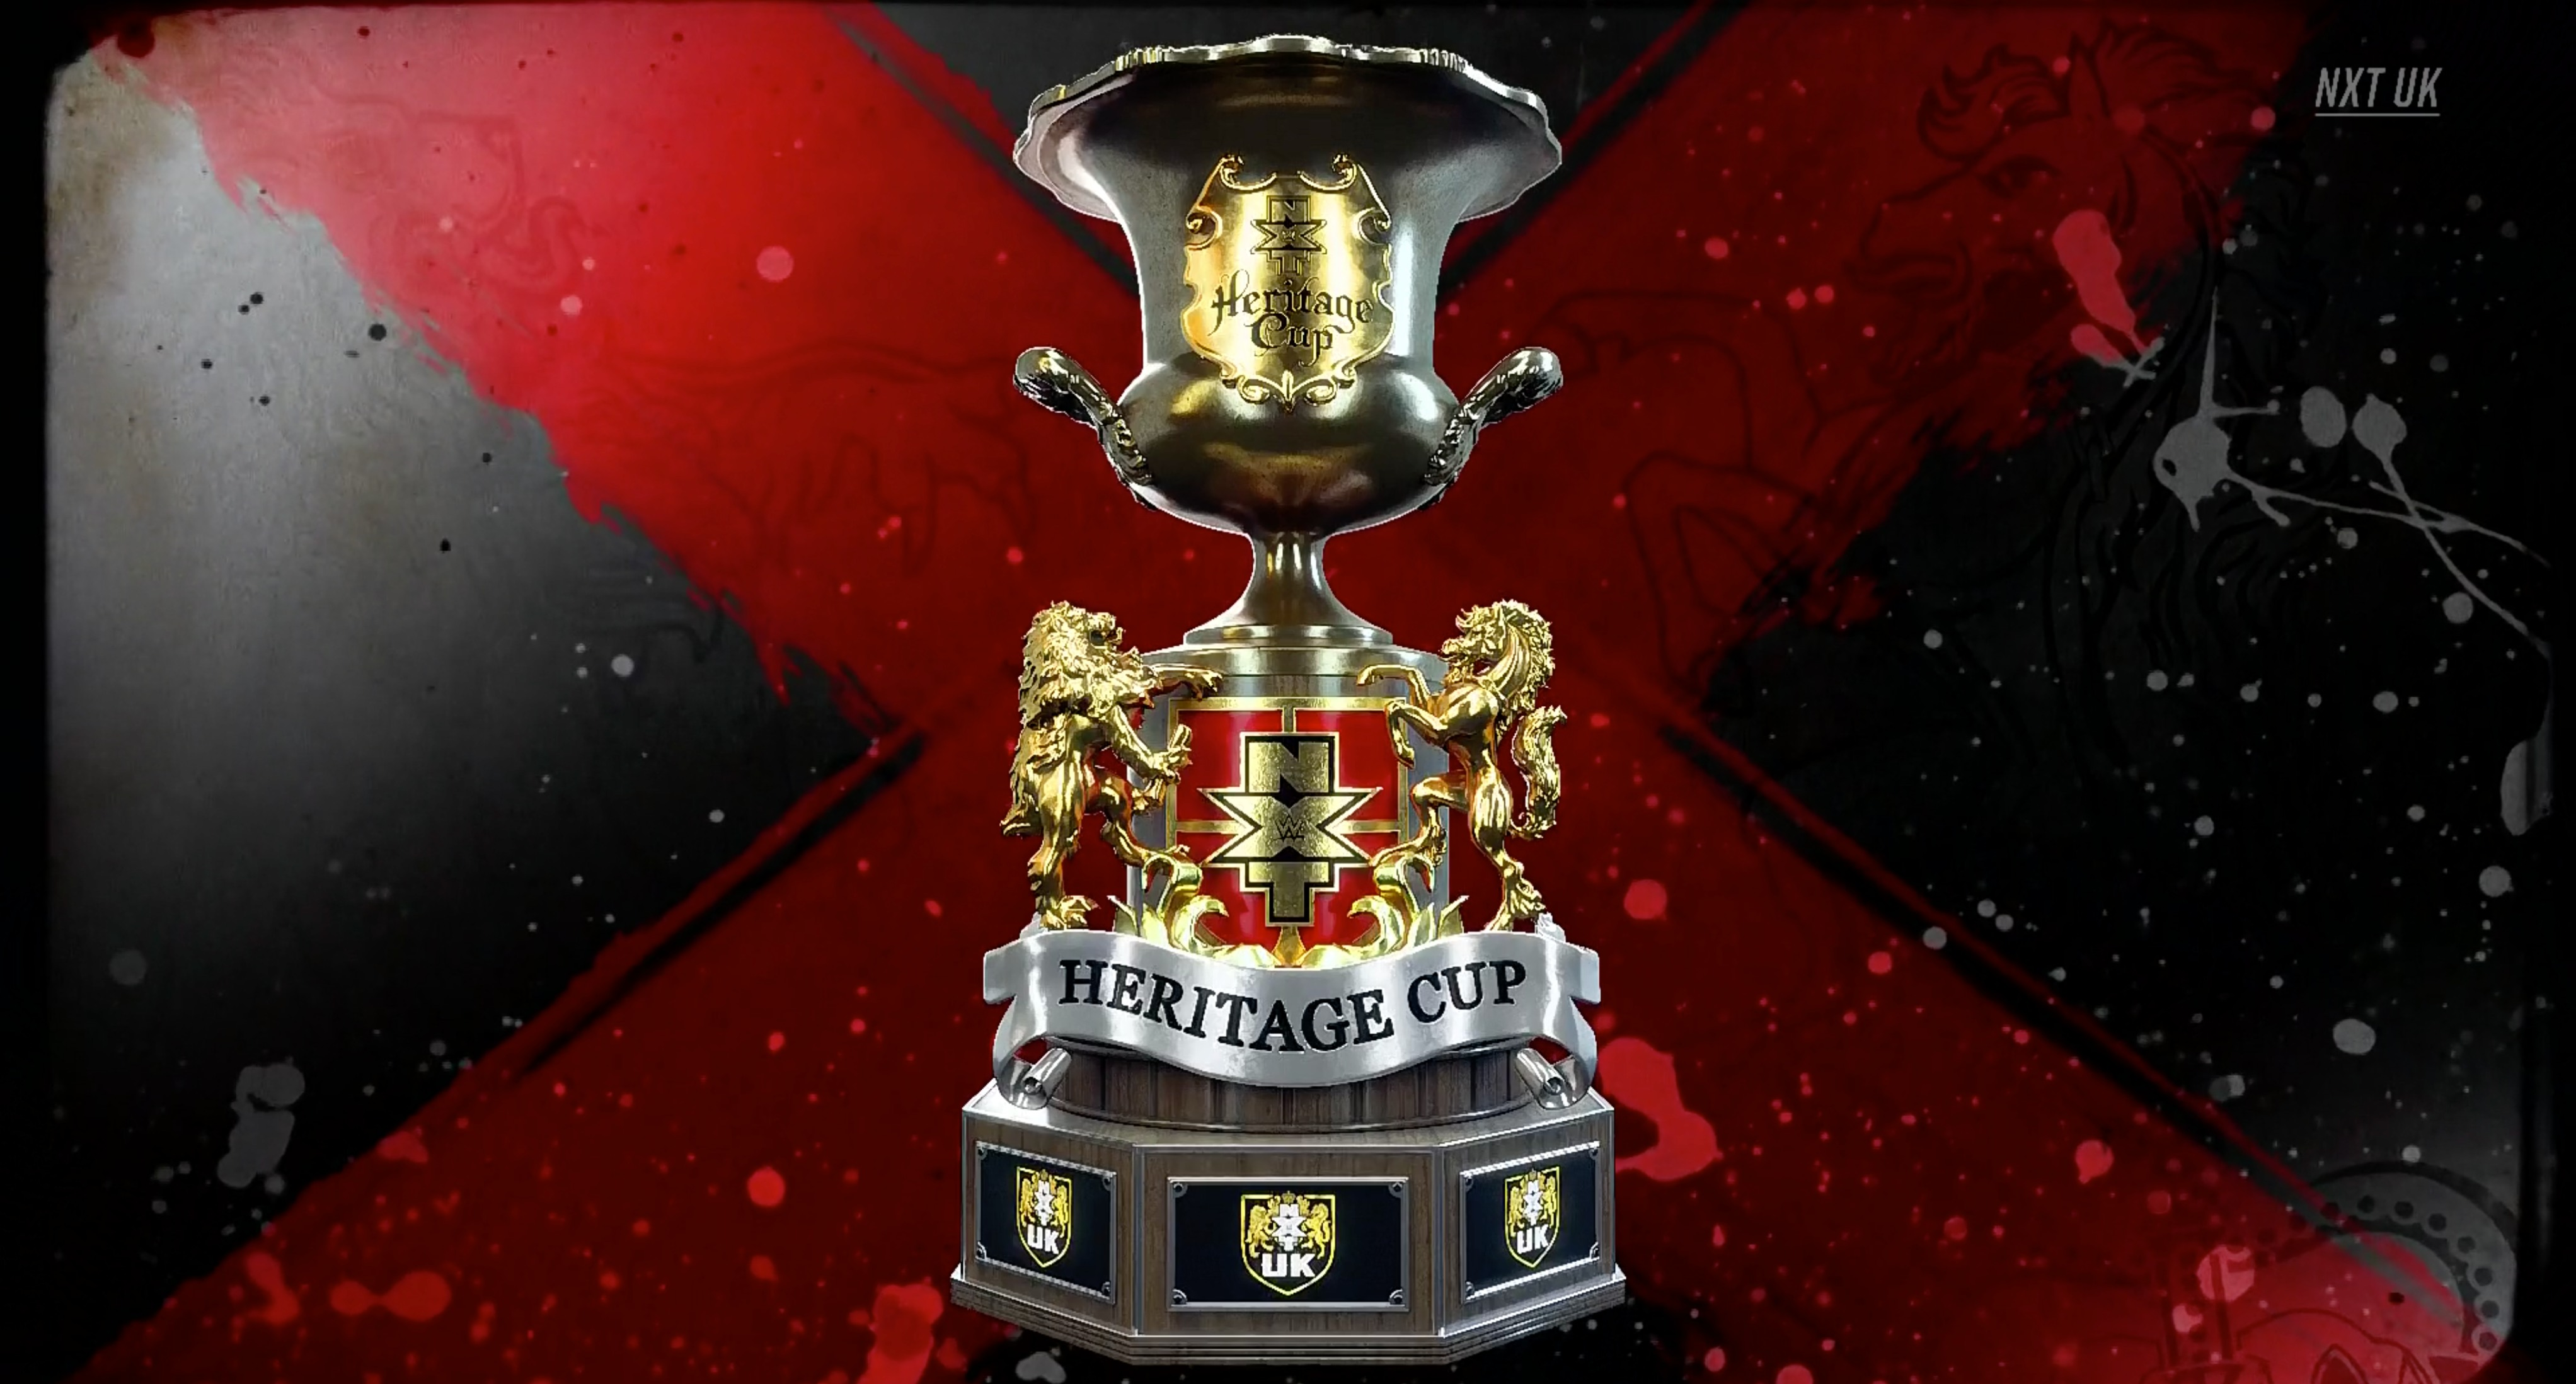 WWE anuncia la NXT UK Heritage Cup – RasslinPod